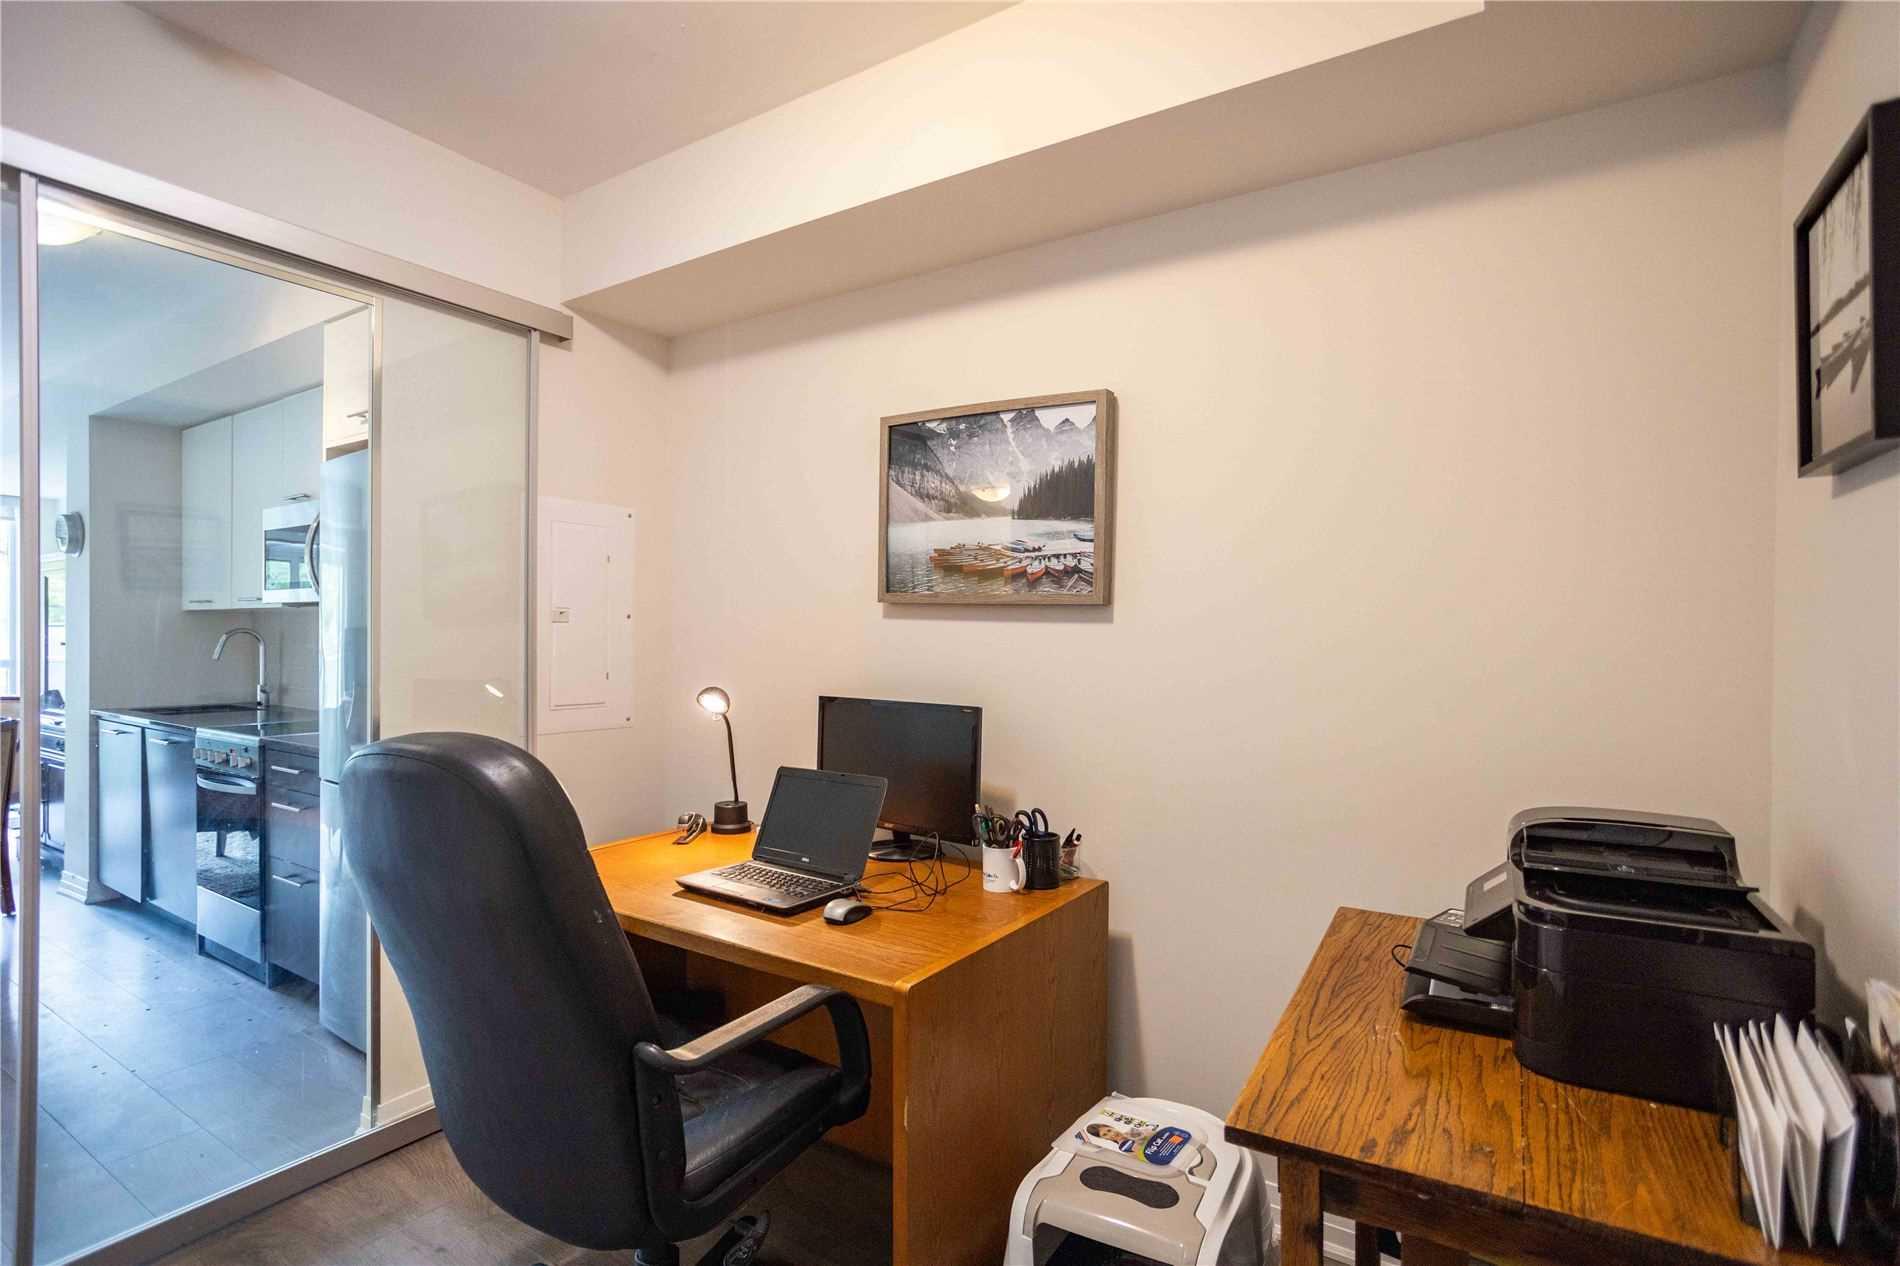 Condo Apt For Sale In Toronto , 2 Bedrooms Bedrooms, ,2 BathroomsBathrooms,Condo Apt,For Sale,313,Danforth